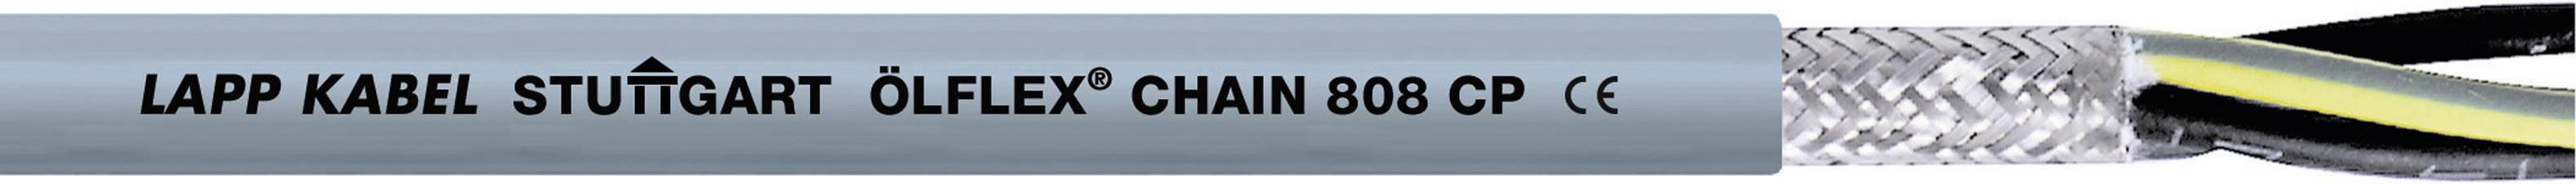 Žíla kabelu LappKabel ÖLFLEX CHAIN 808 CP 4G1,5 (1027777), 4x 1,5 mm², polyurethan, Ø 8,4 mm, stíněný, 100 m,